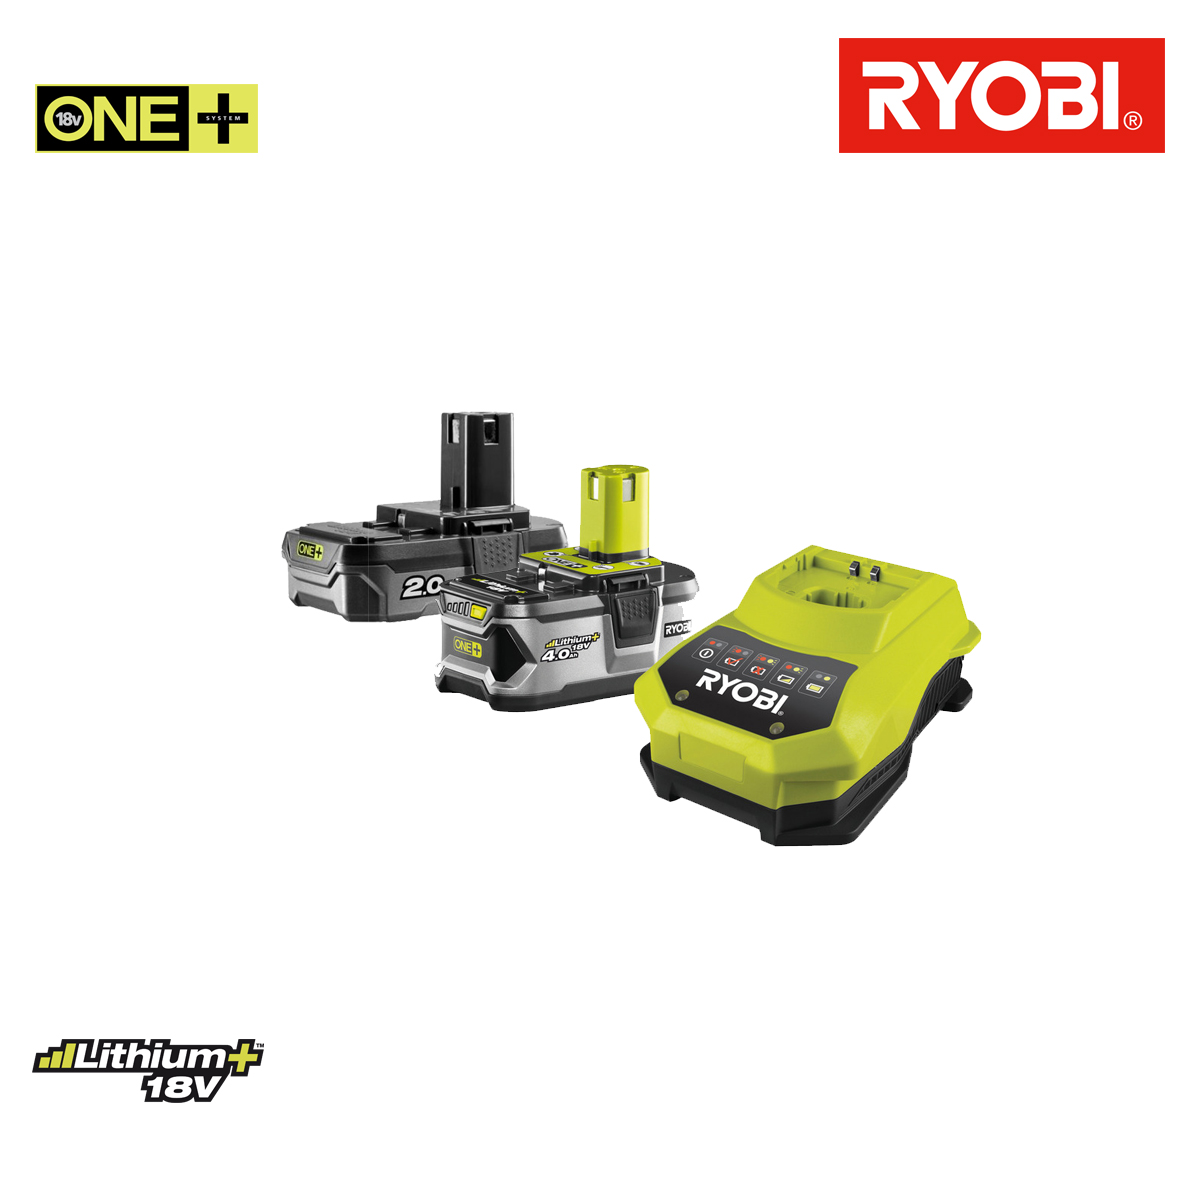 ryobi pack 2 batteries 18v oneplus et et chargeur rapide lithium ion. Black Bedroom Furniture Sets. Home Design Ideas